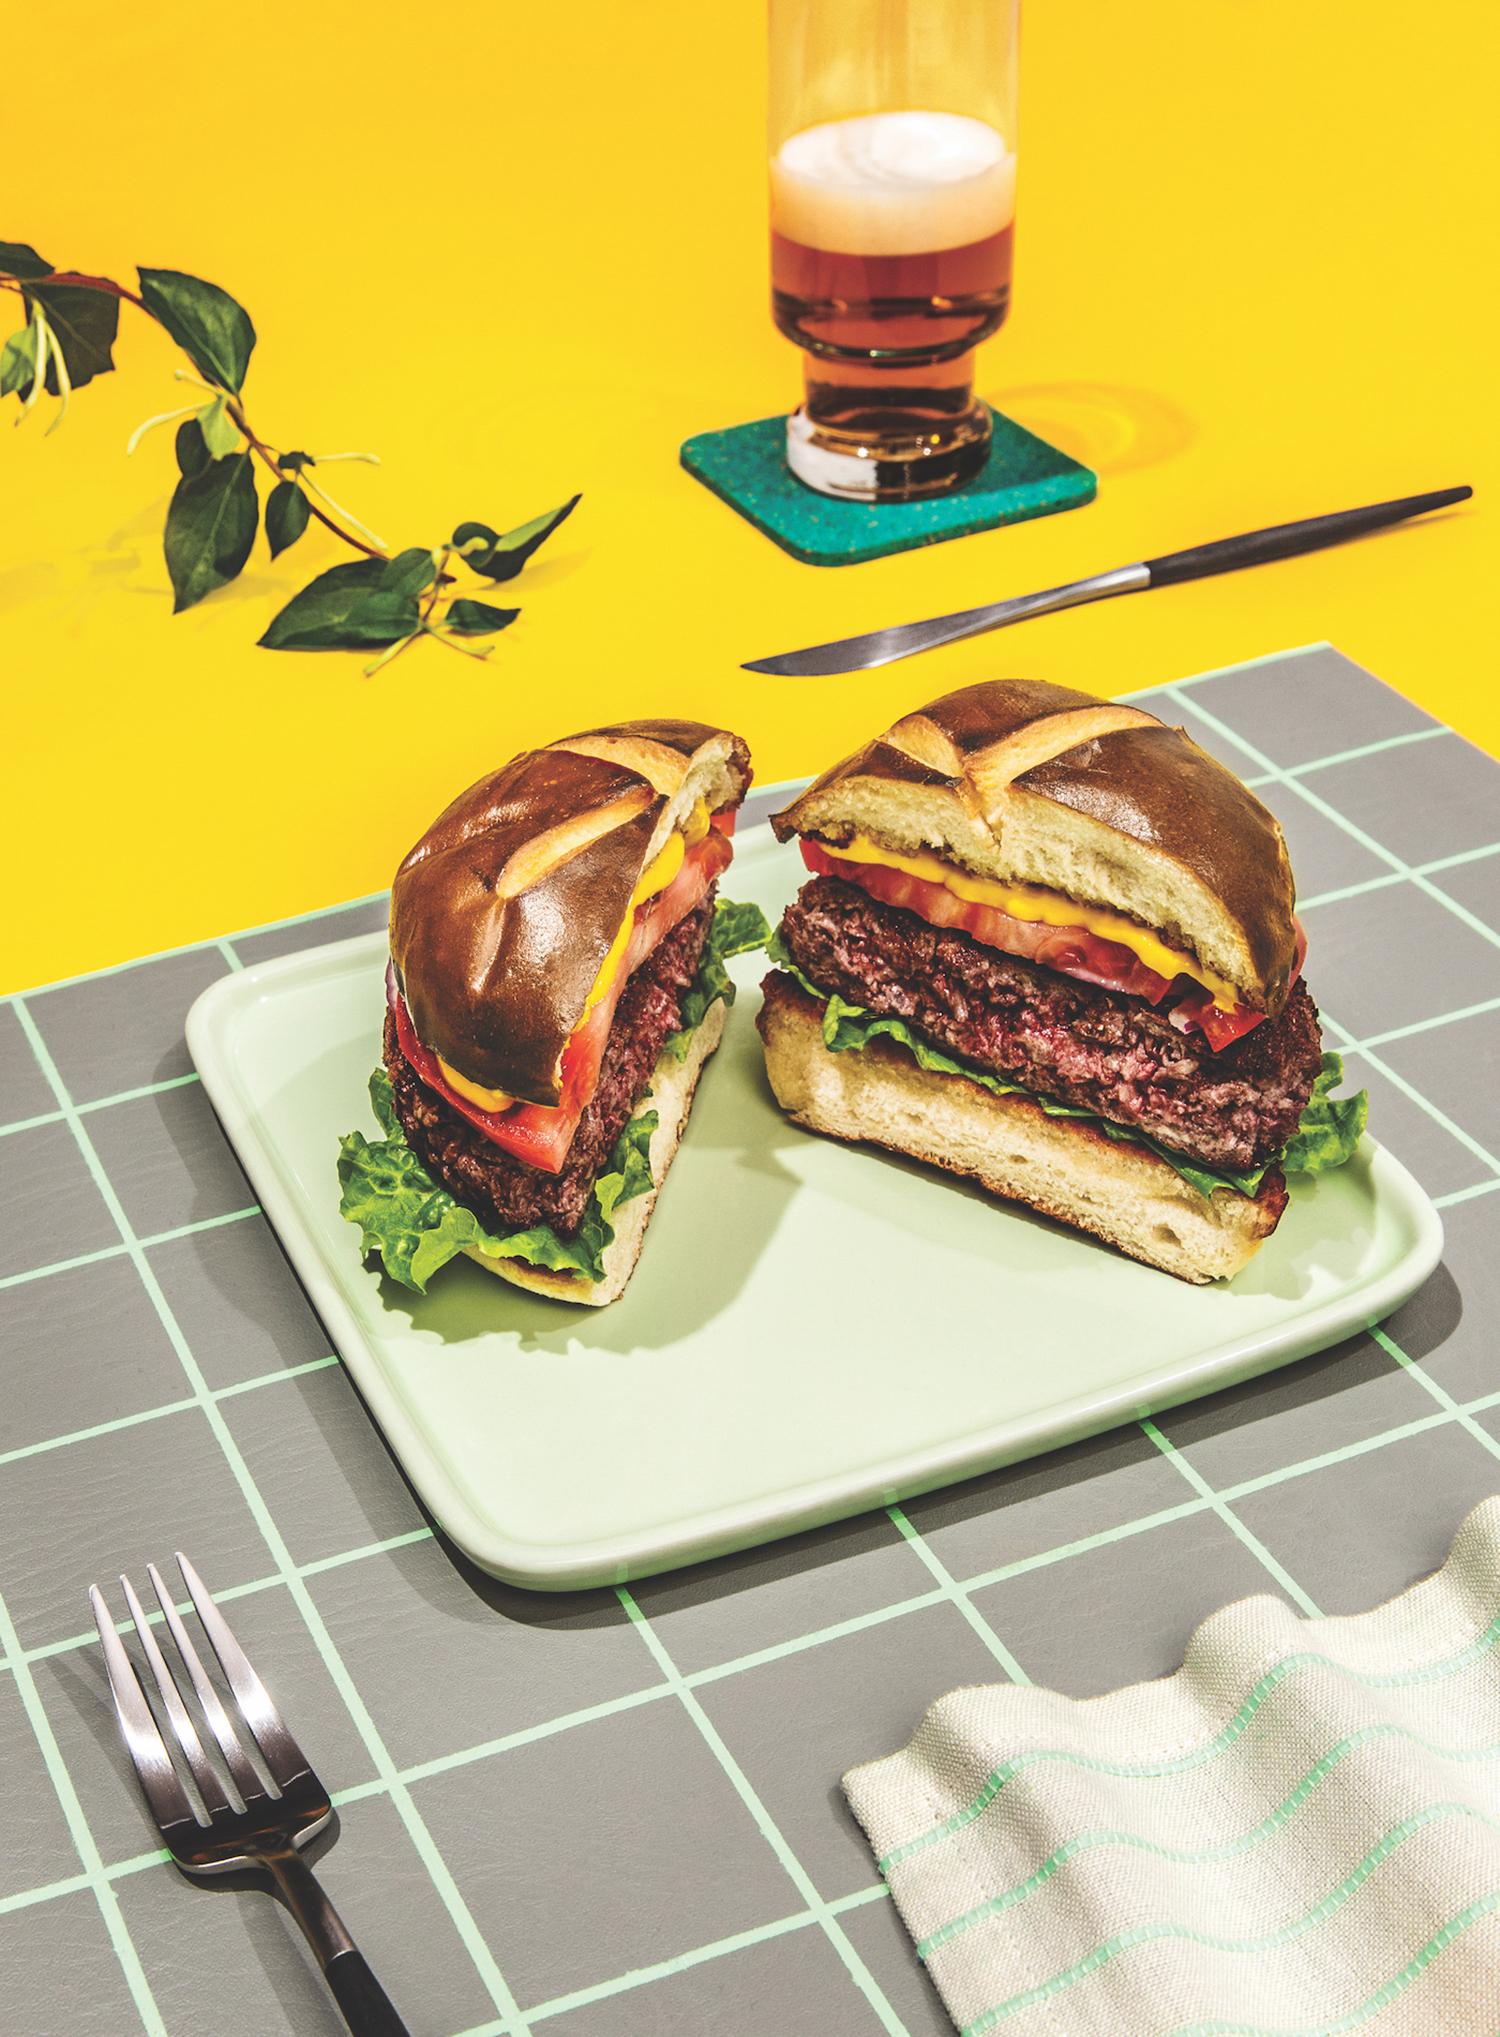 impos-burger.jpg